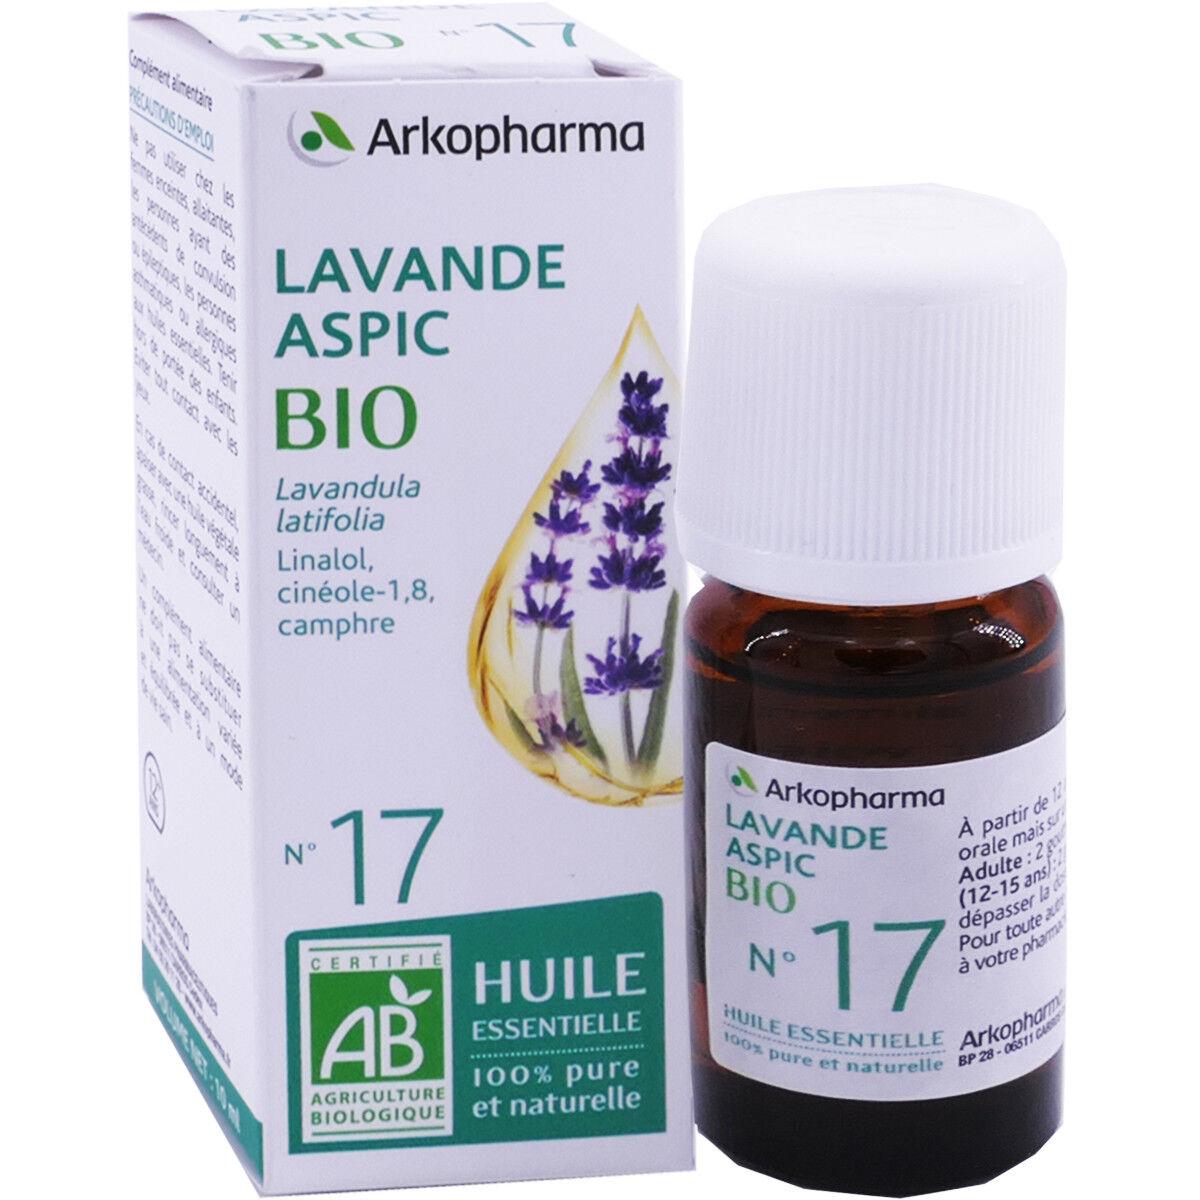 Arkopharma huile essentielle lavande aspic bio n°17 10 ml